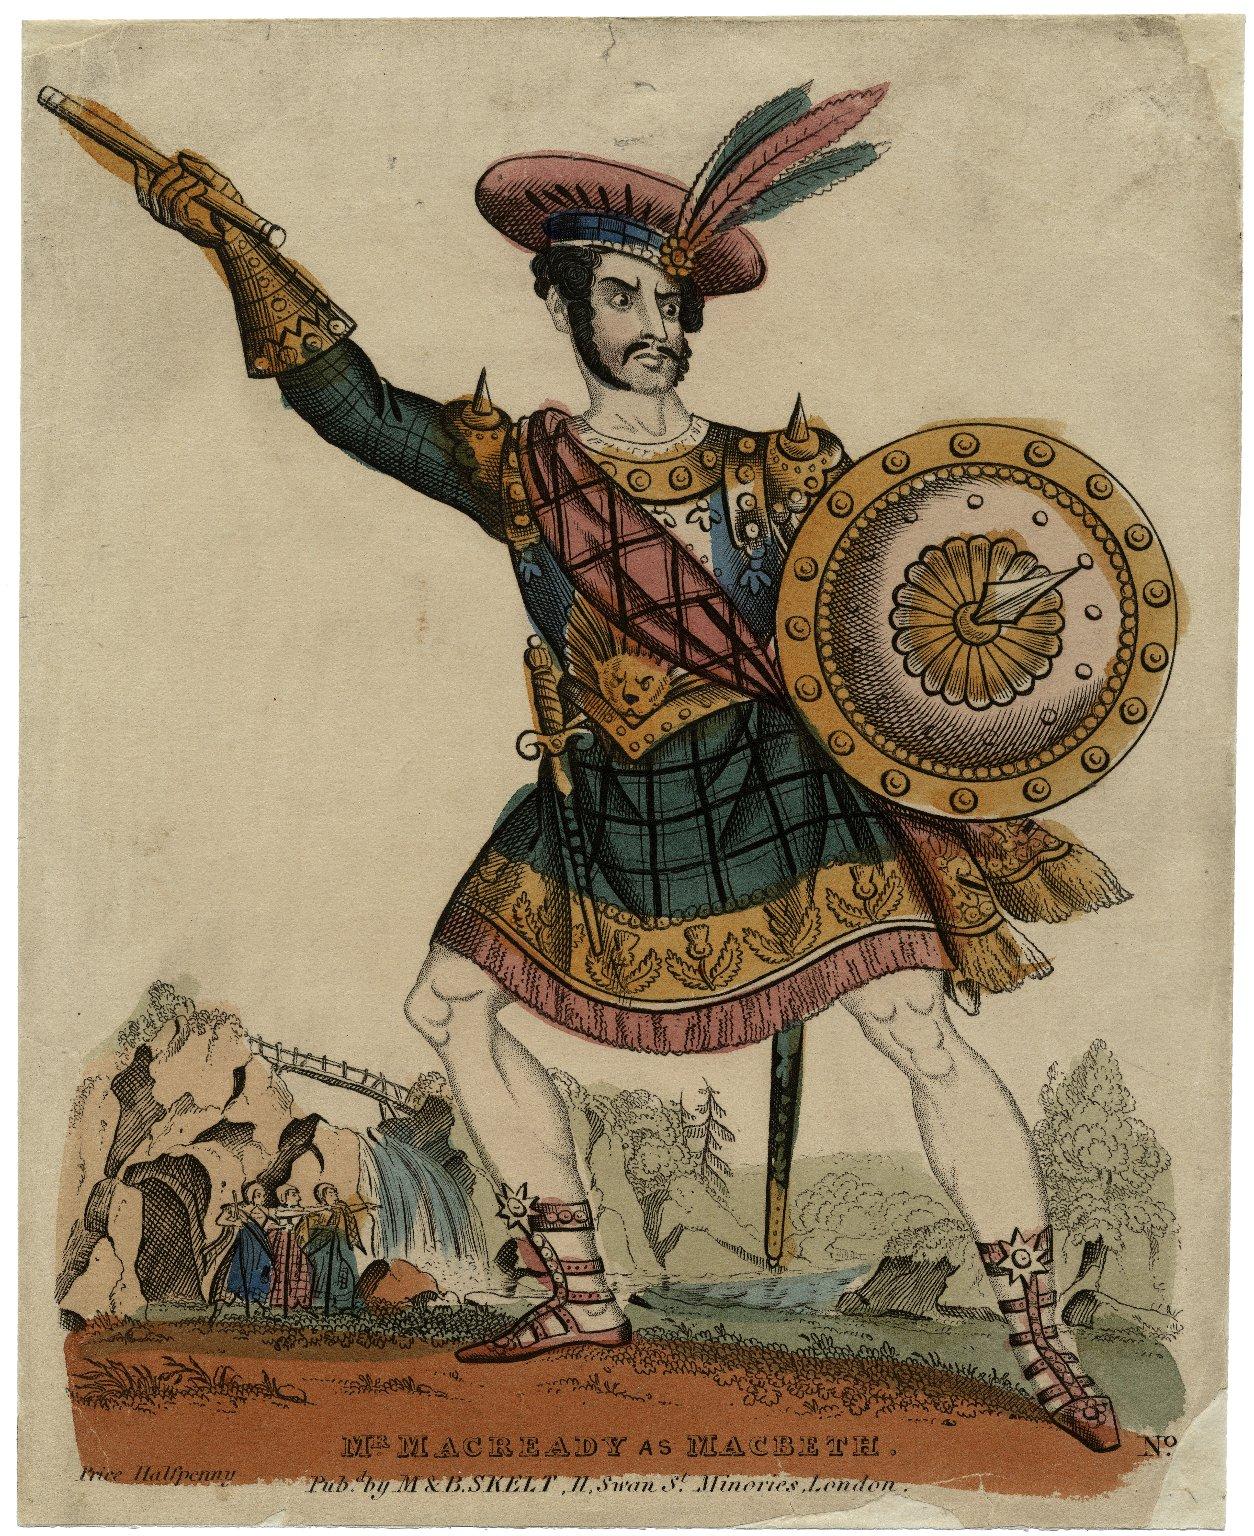 Mr. Macready as Macbeth [in Shakespeare's Macbeth.] [graphic].